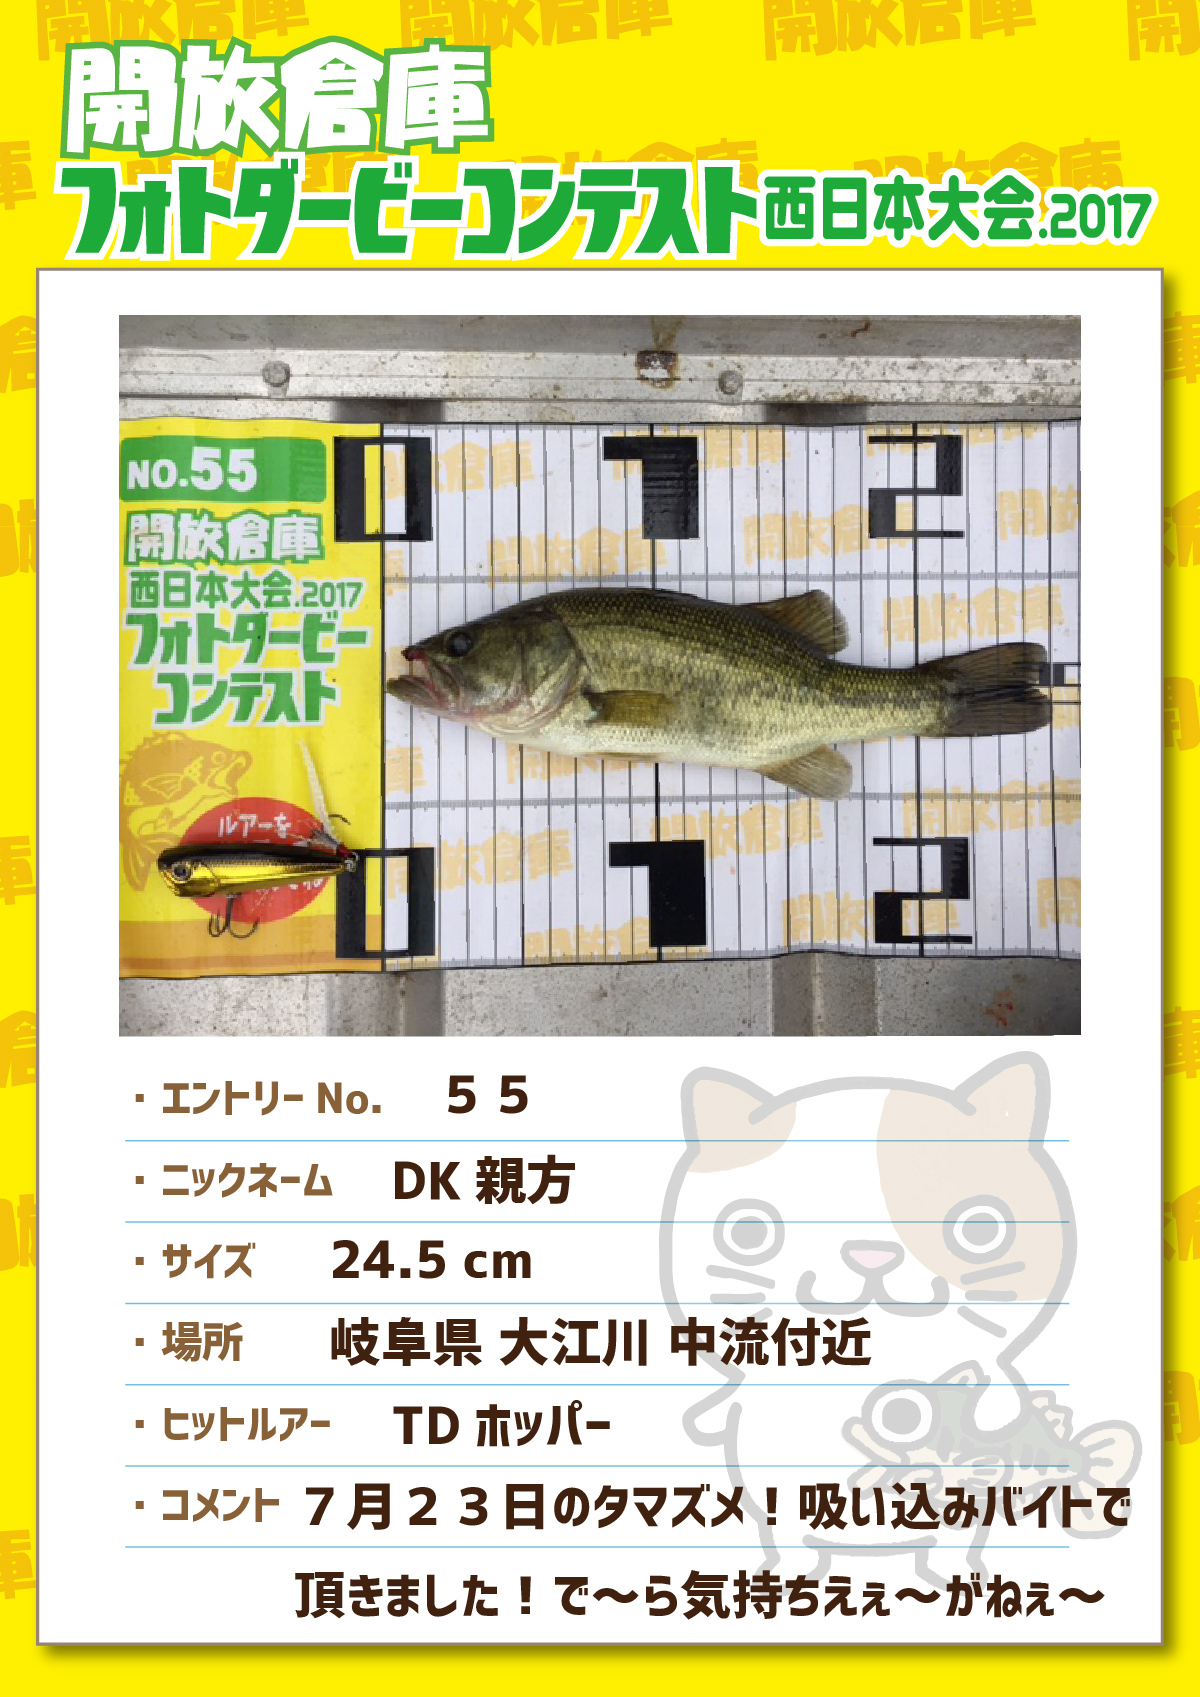 No.055 DK親方 24.5cm 岐阜県大江川中流付近 TDホッパー 7月23日のタマズメ!吸い込みバイトで頂きました!でーらきもちえぇがねぇー